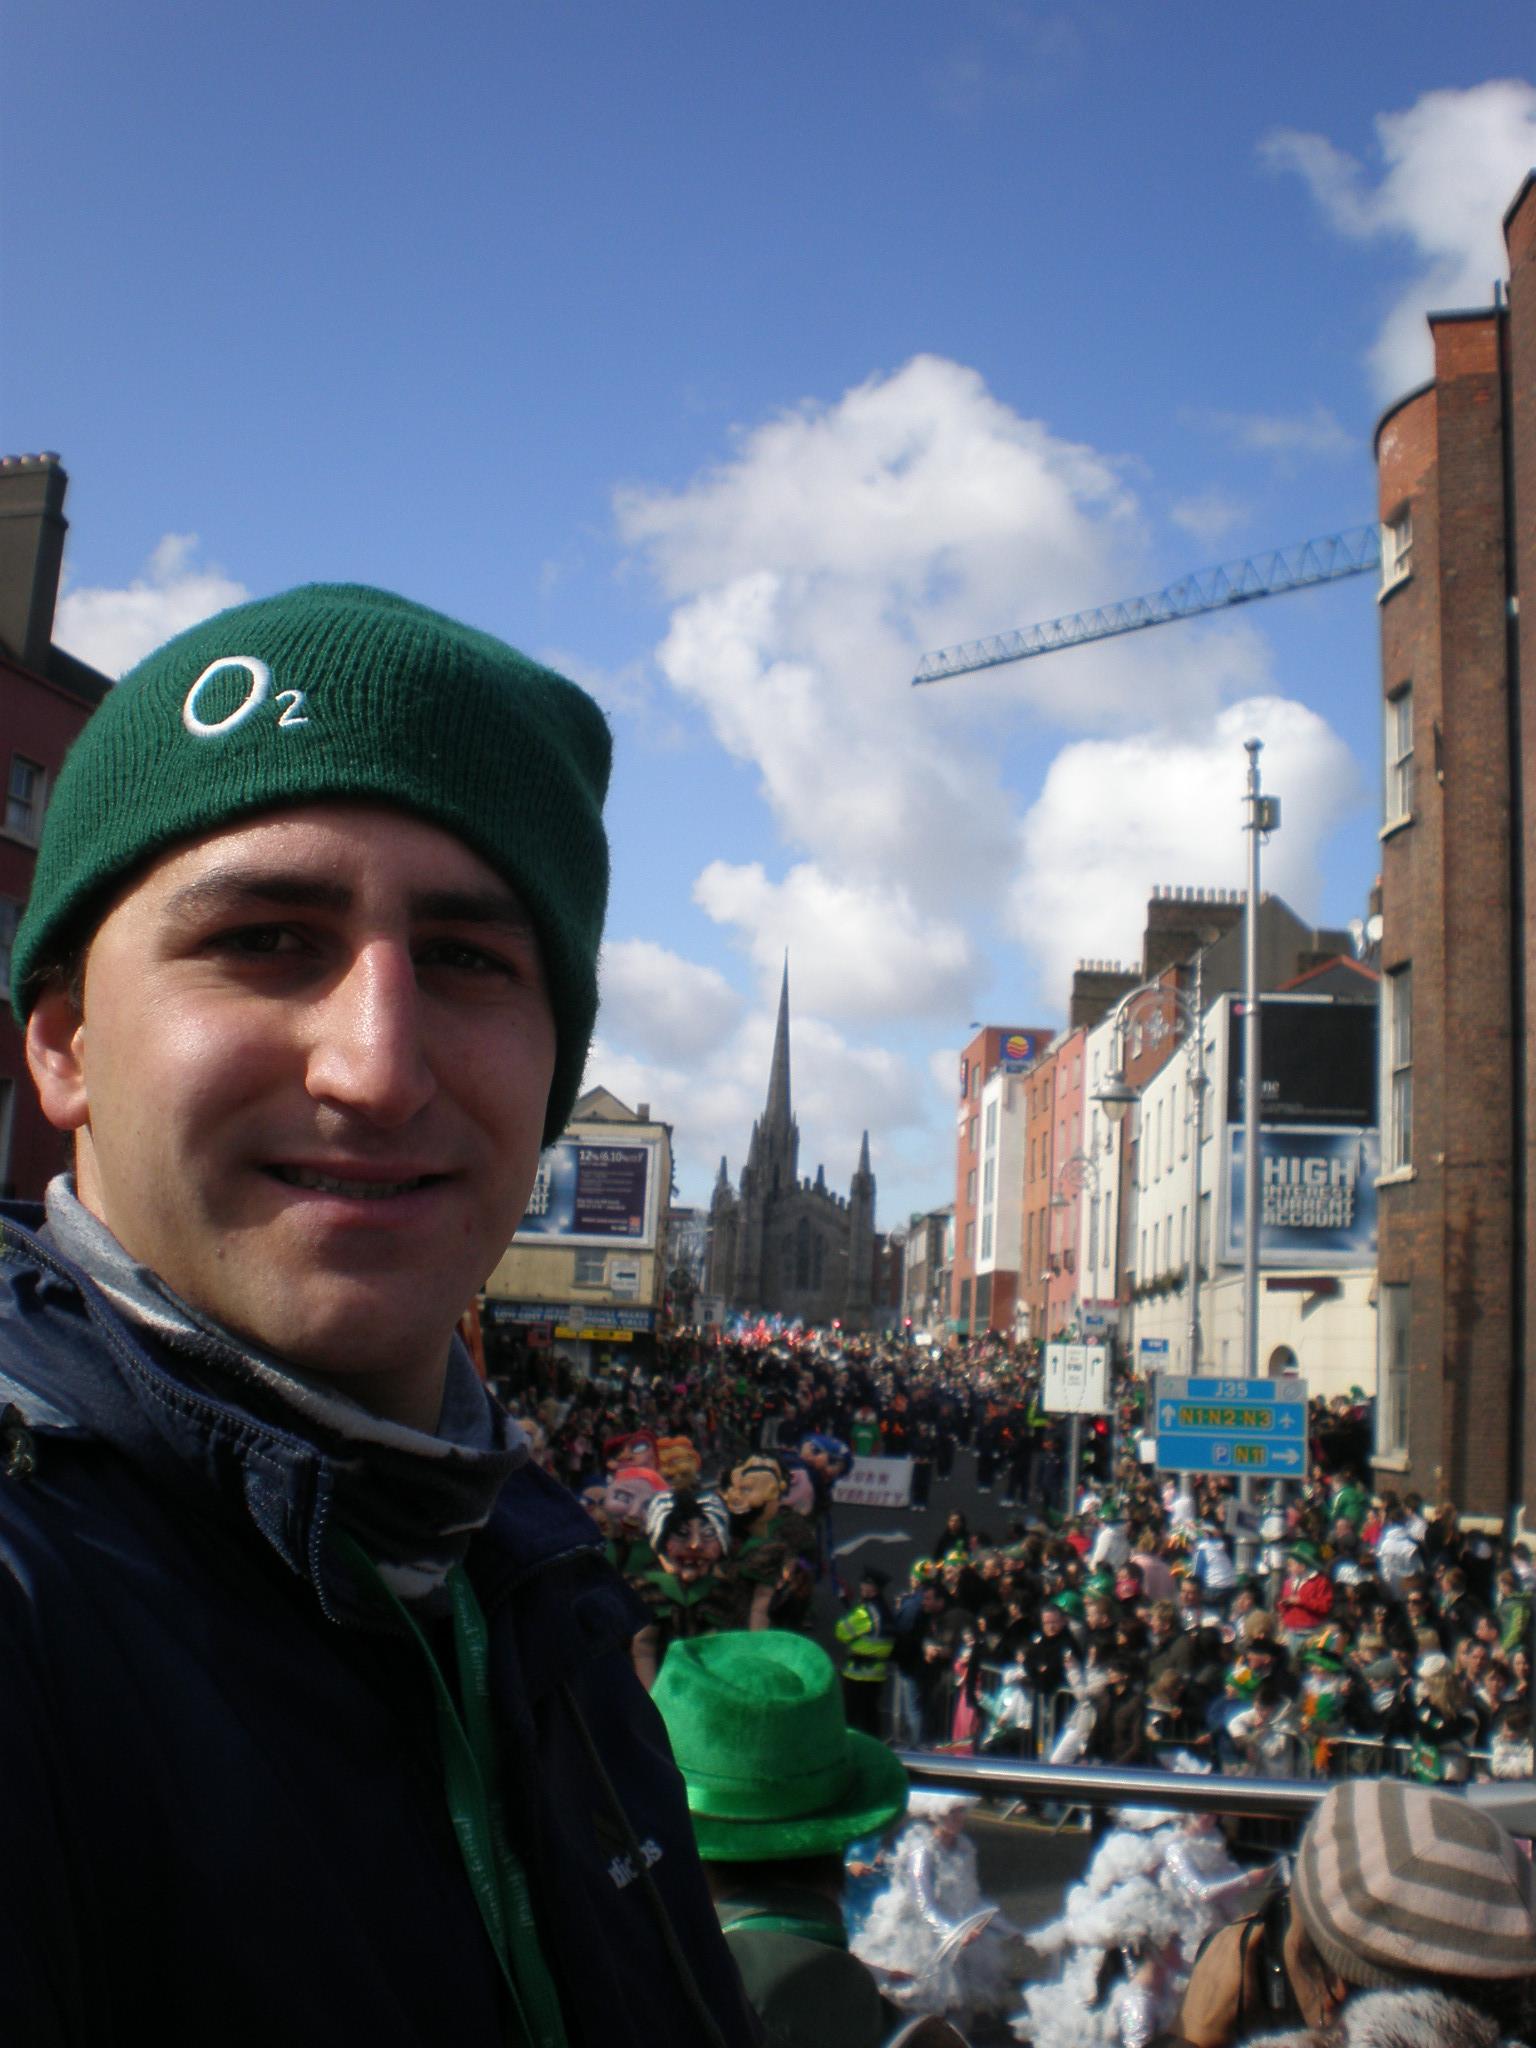 JP en el St. Patrick's Festival